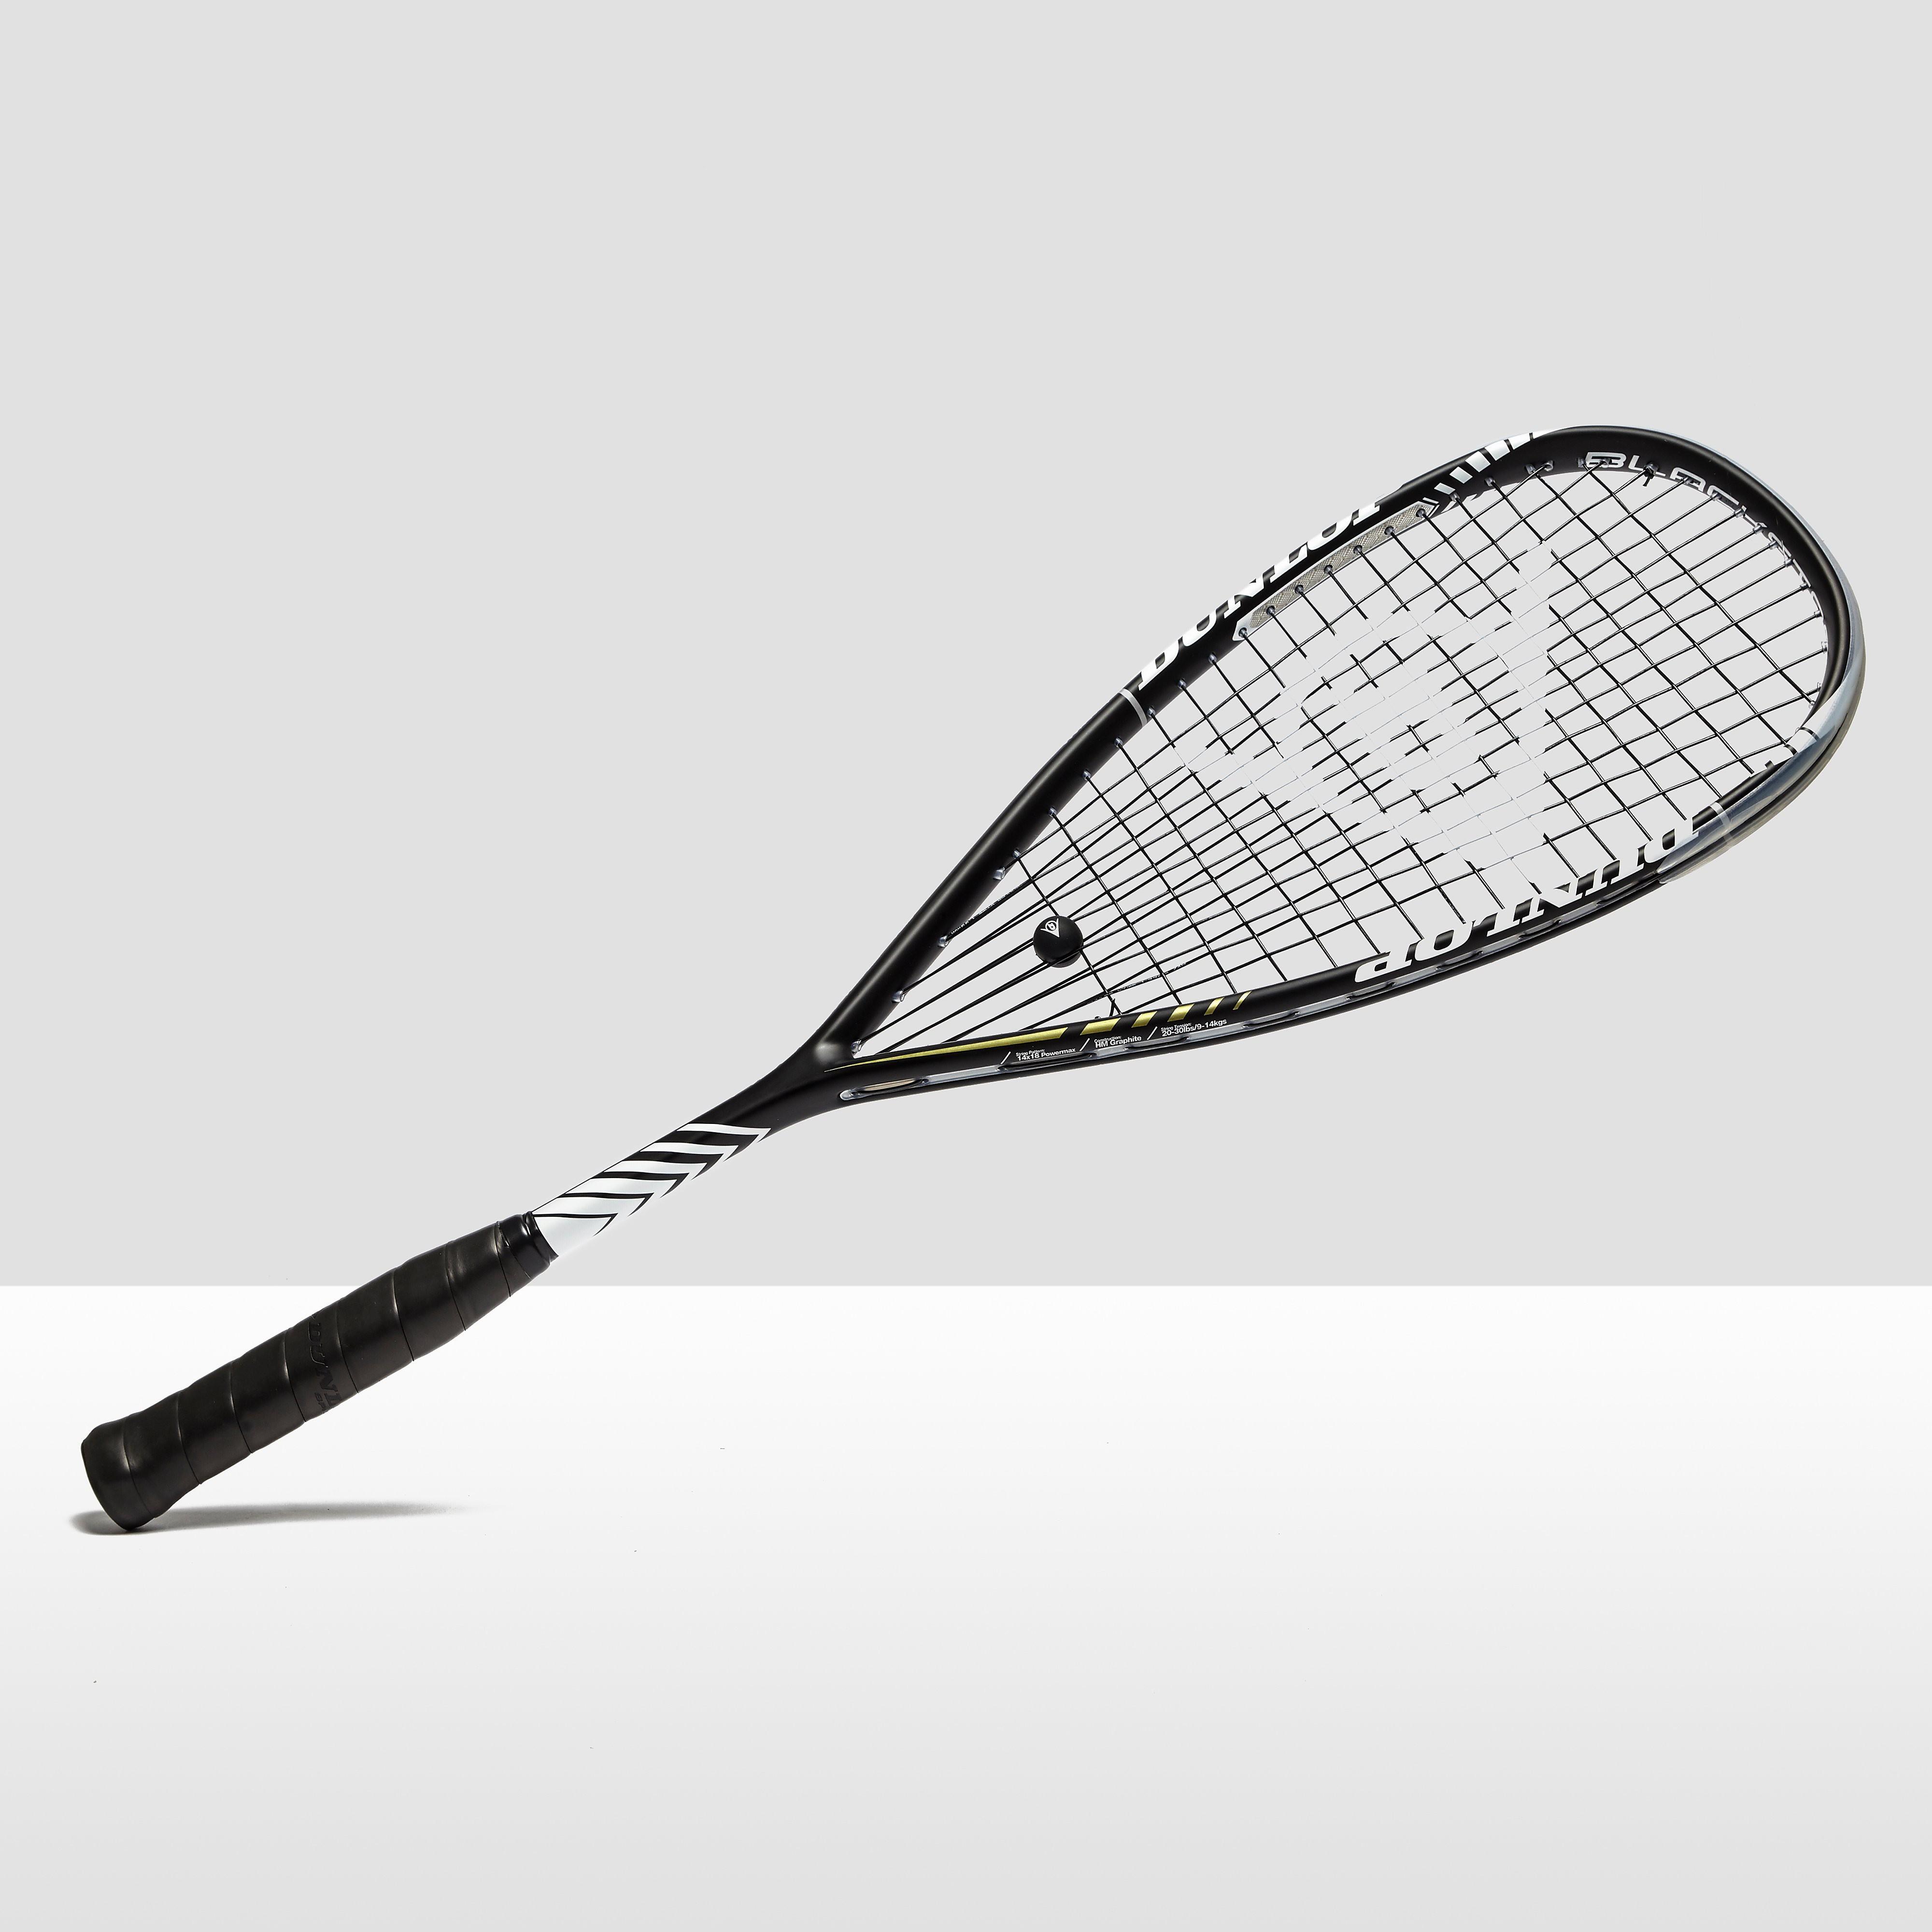 Dunlop Blackstorm Titanium 2.0 Squash Racket